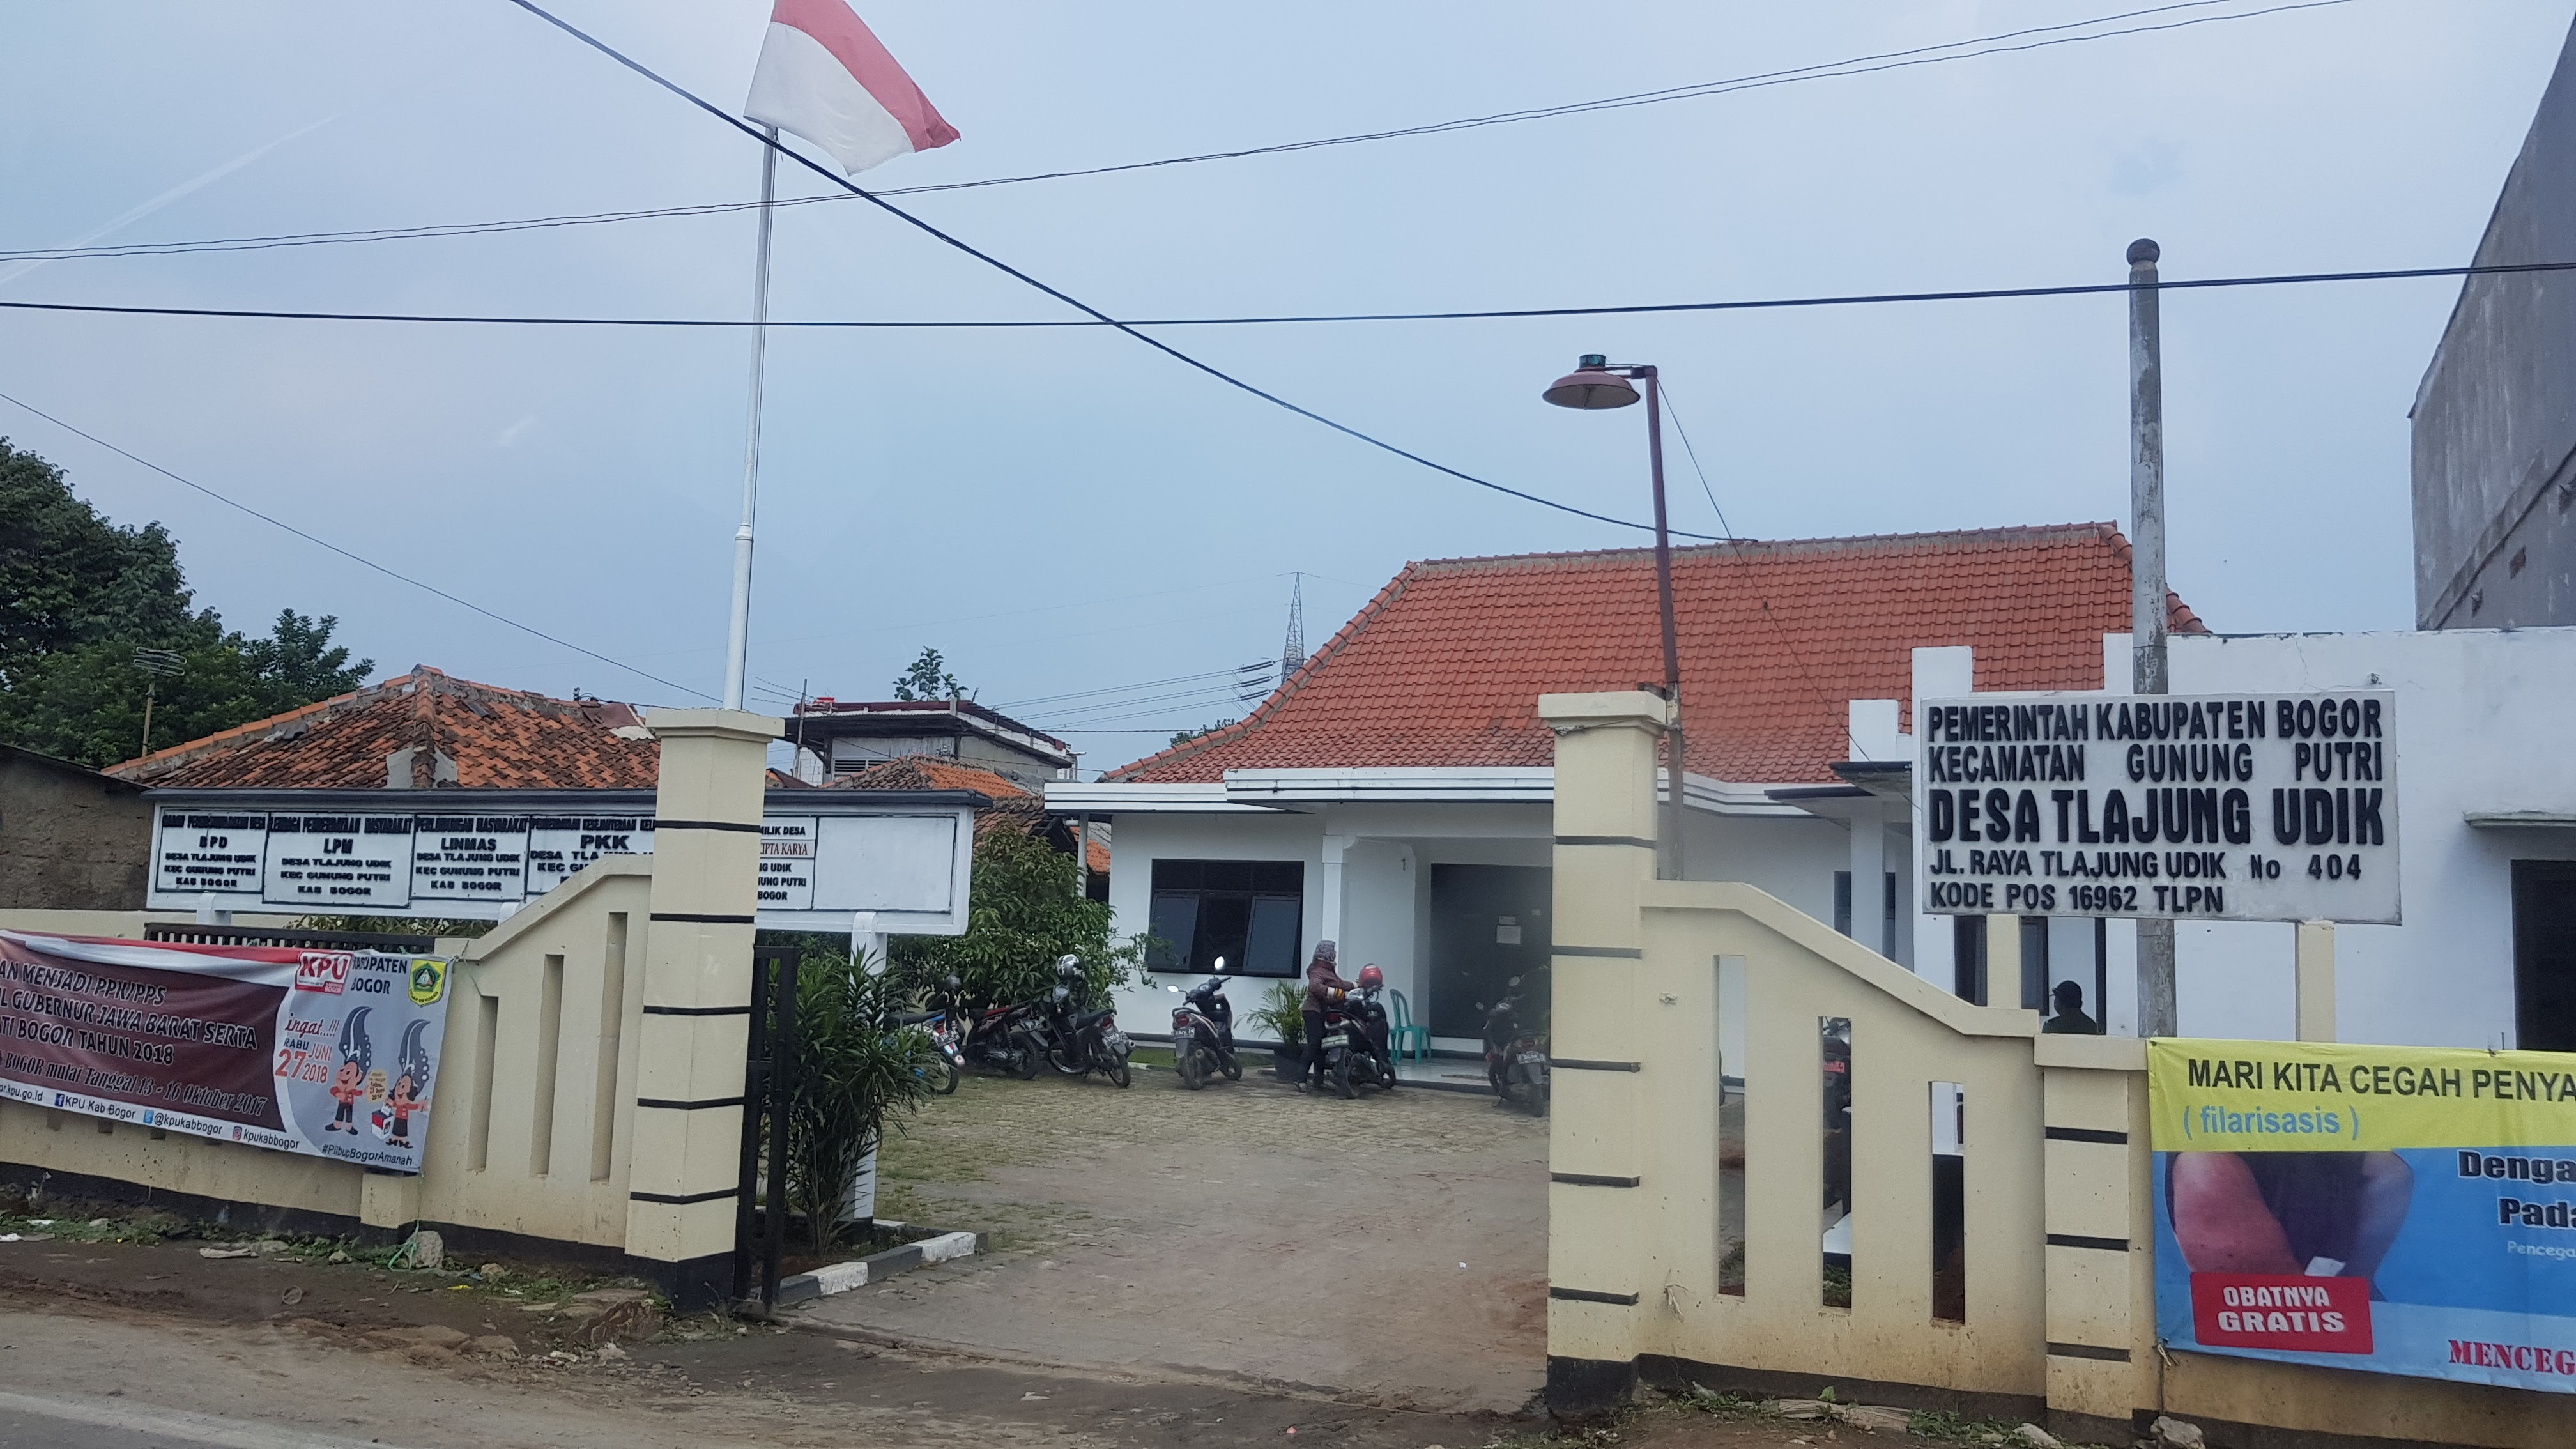 FileKantor Desa Tlajung Udik, Bogor.jpg   Wikimedia Commons